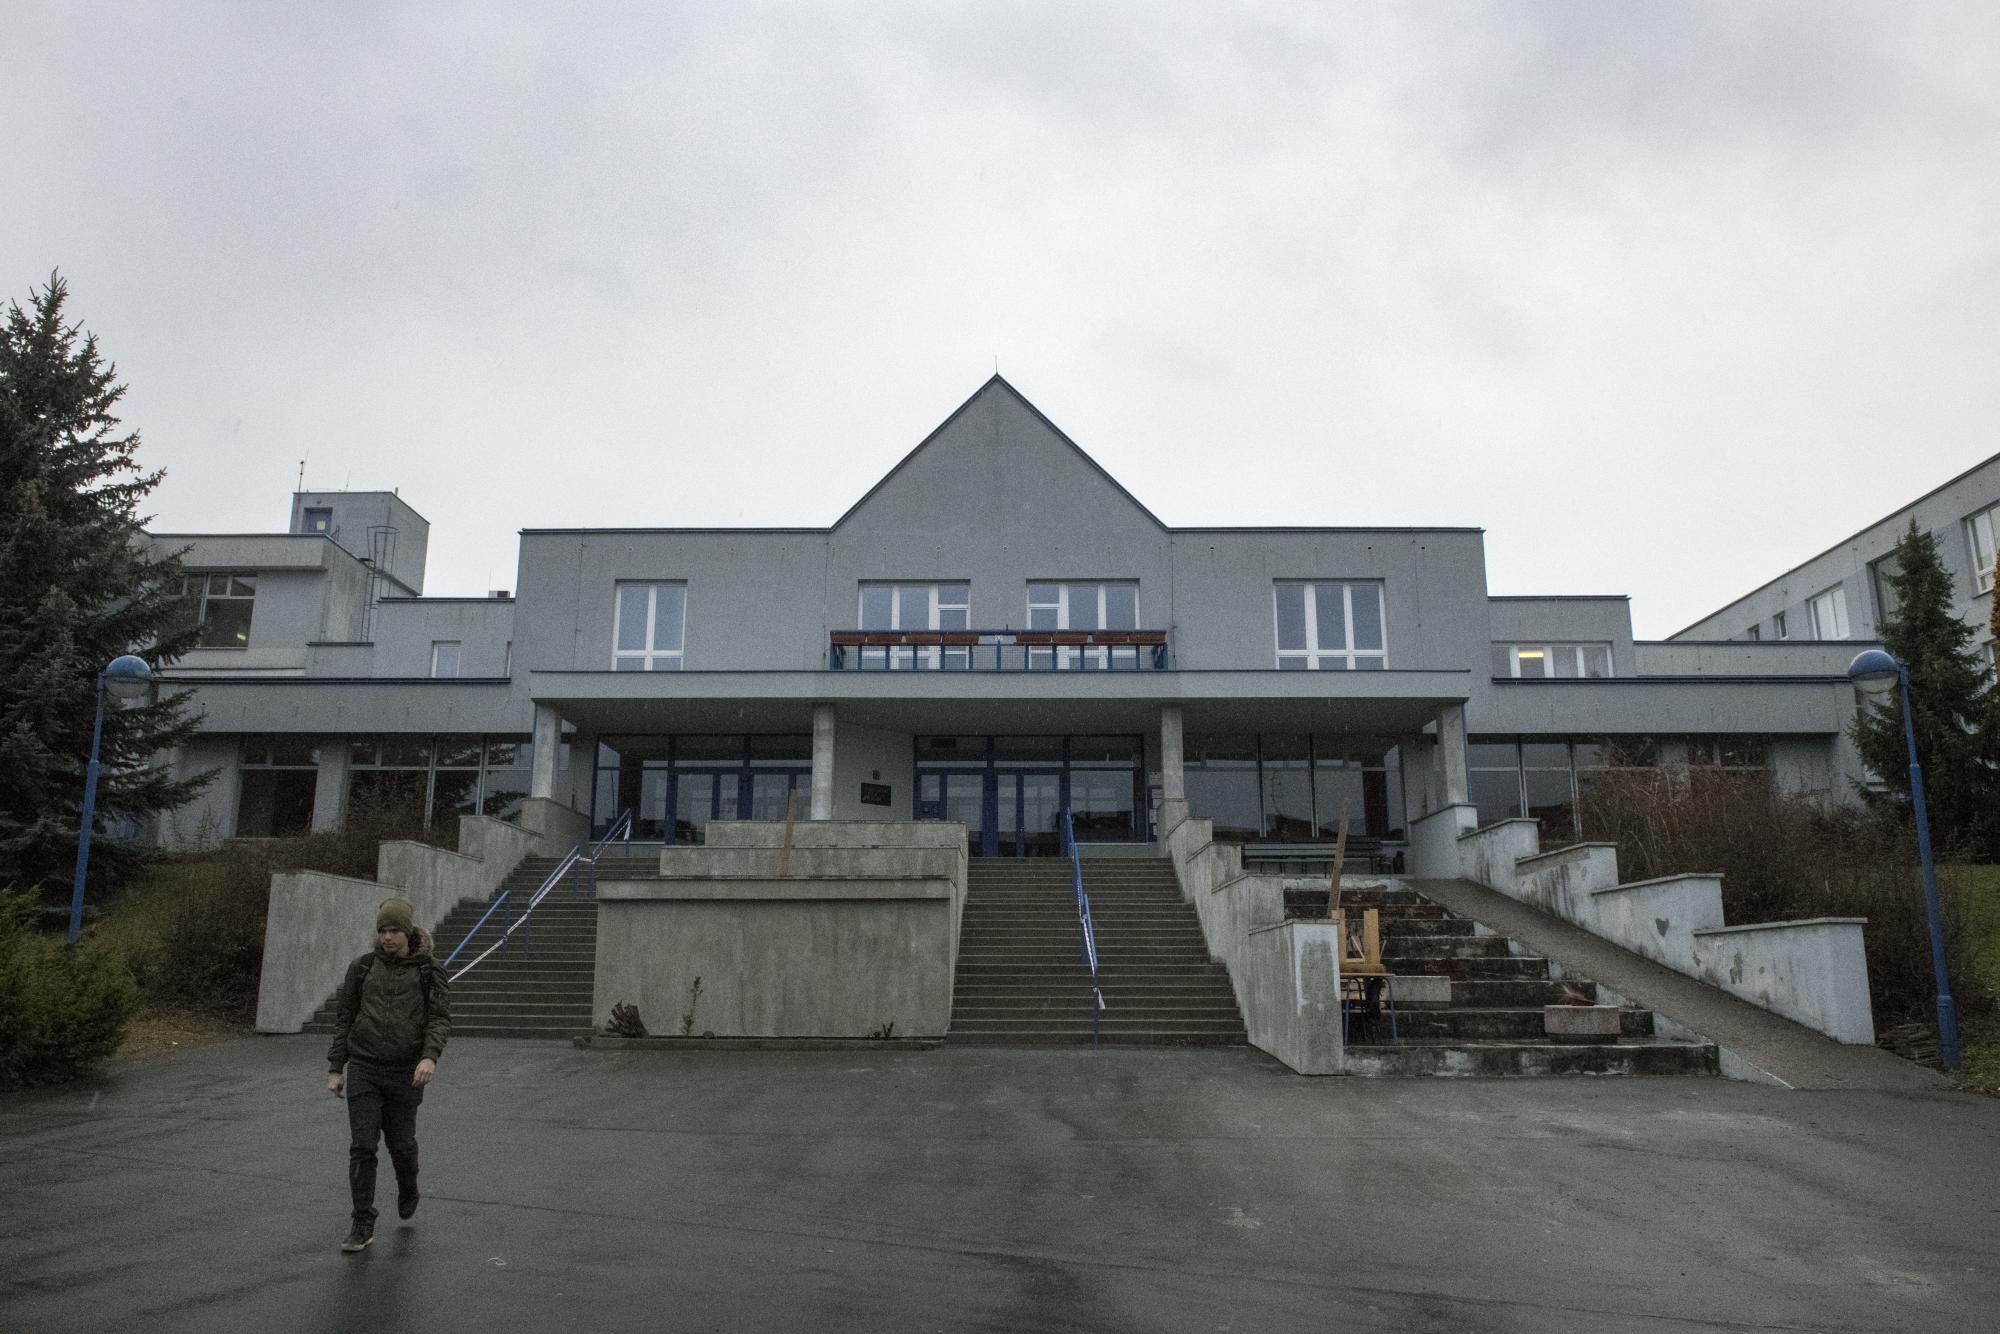 Gymnázium Jana Palacha, Mělník